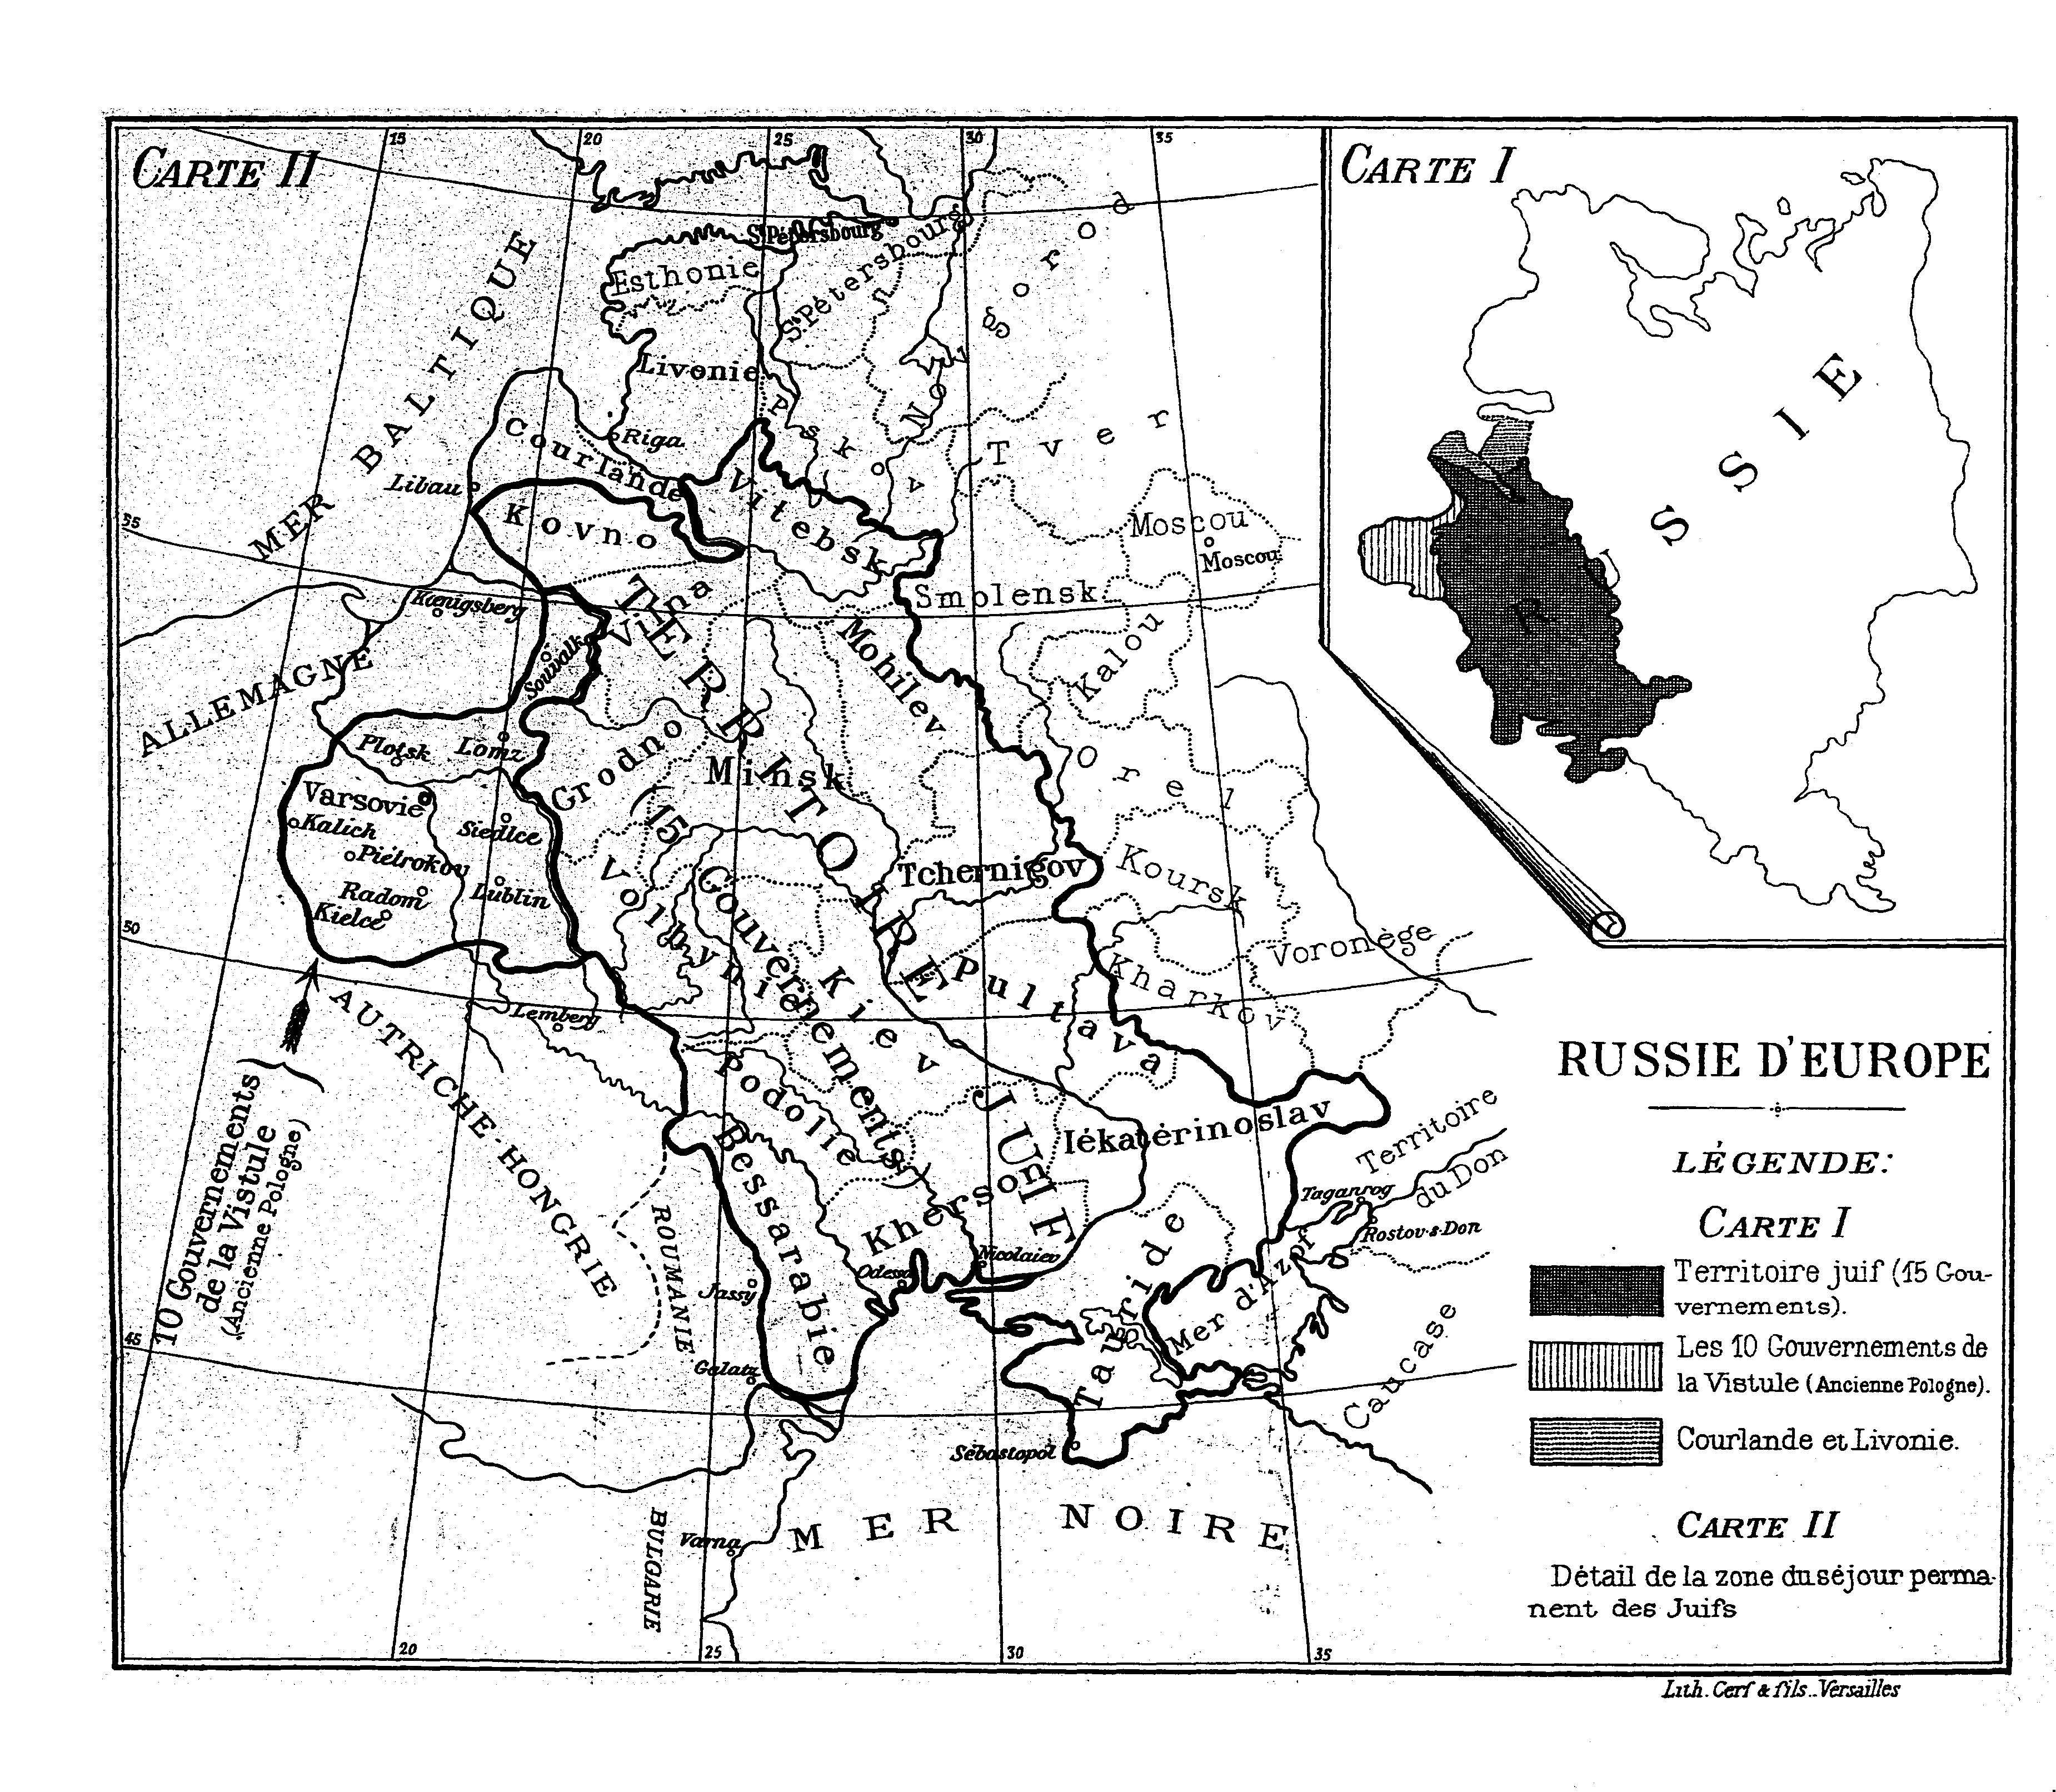 Les_Juifs_de_Russie-Carte.jpg